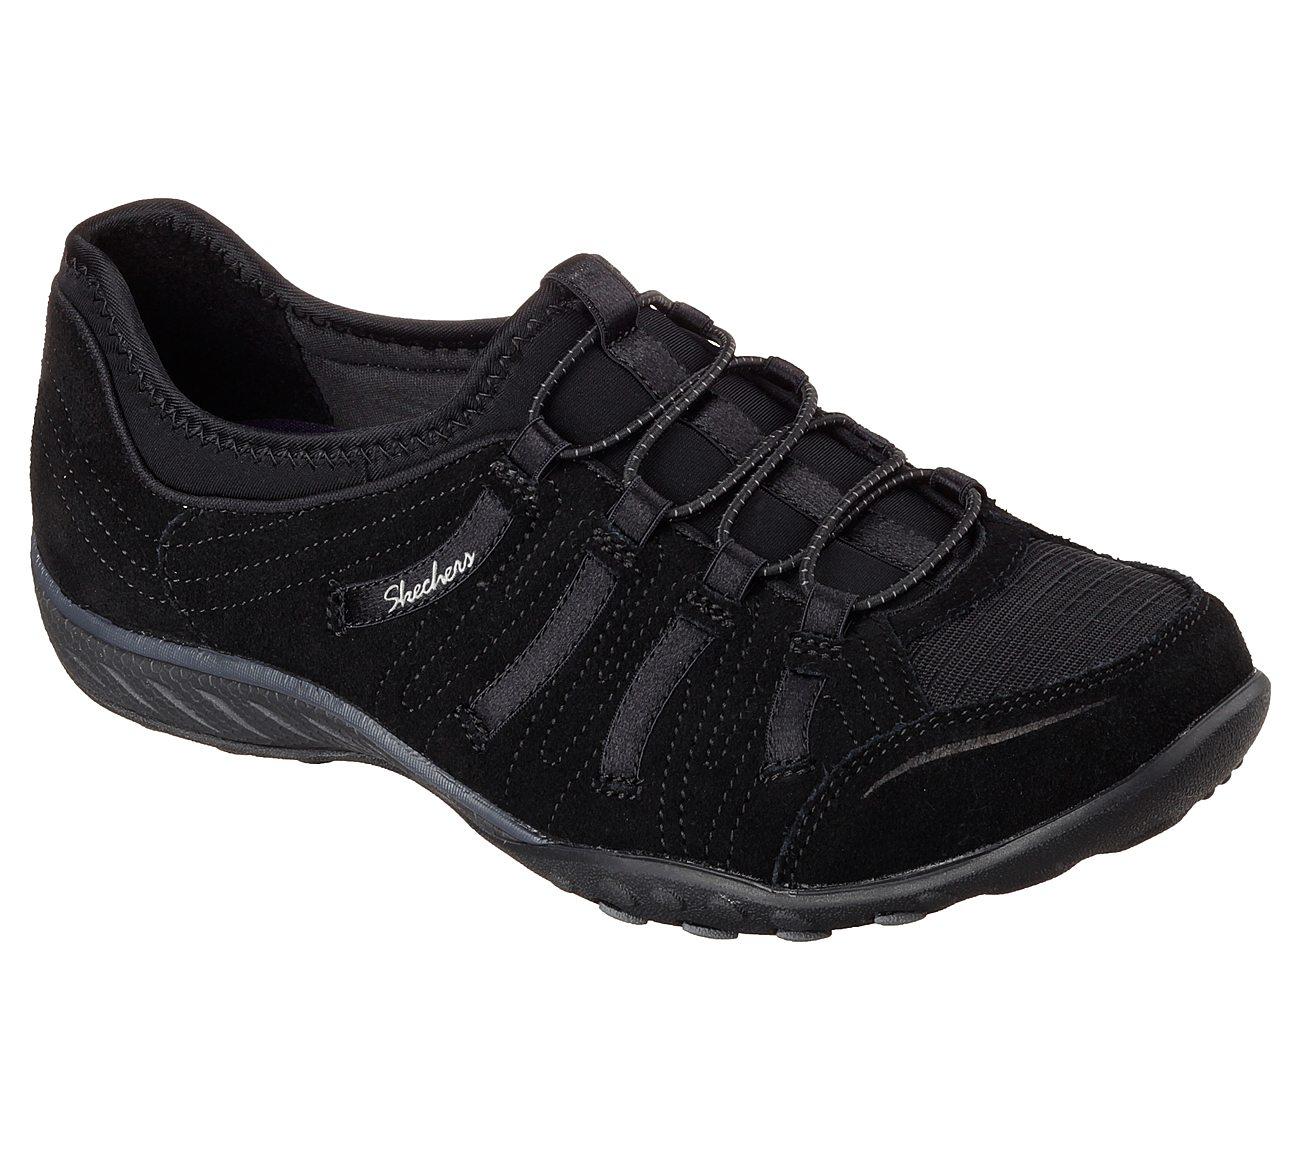 Skechers Shoes  Skechers Big Bucks 22478 Womens Sports Shoes Black